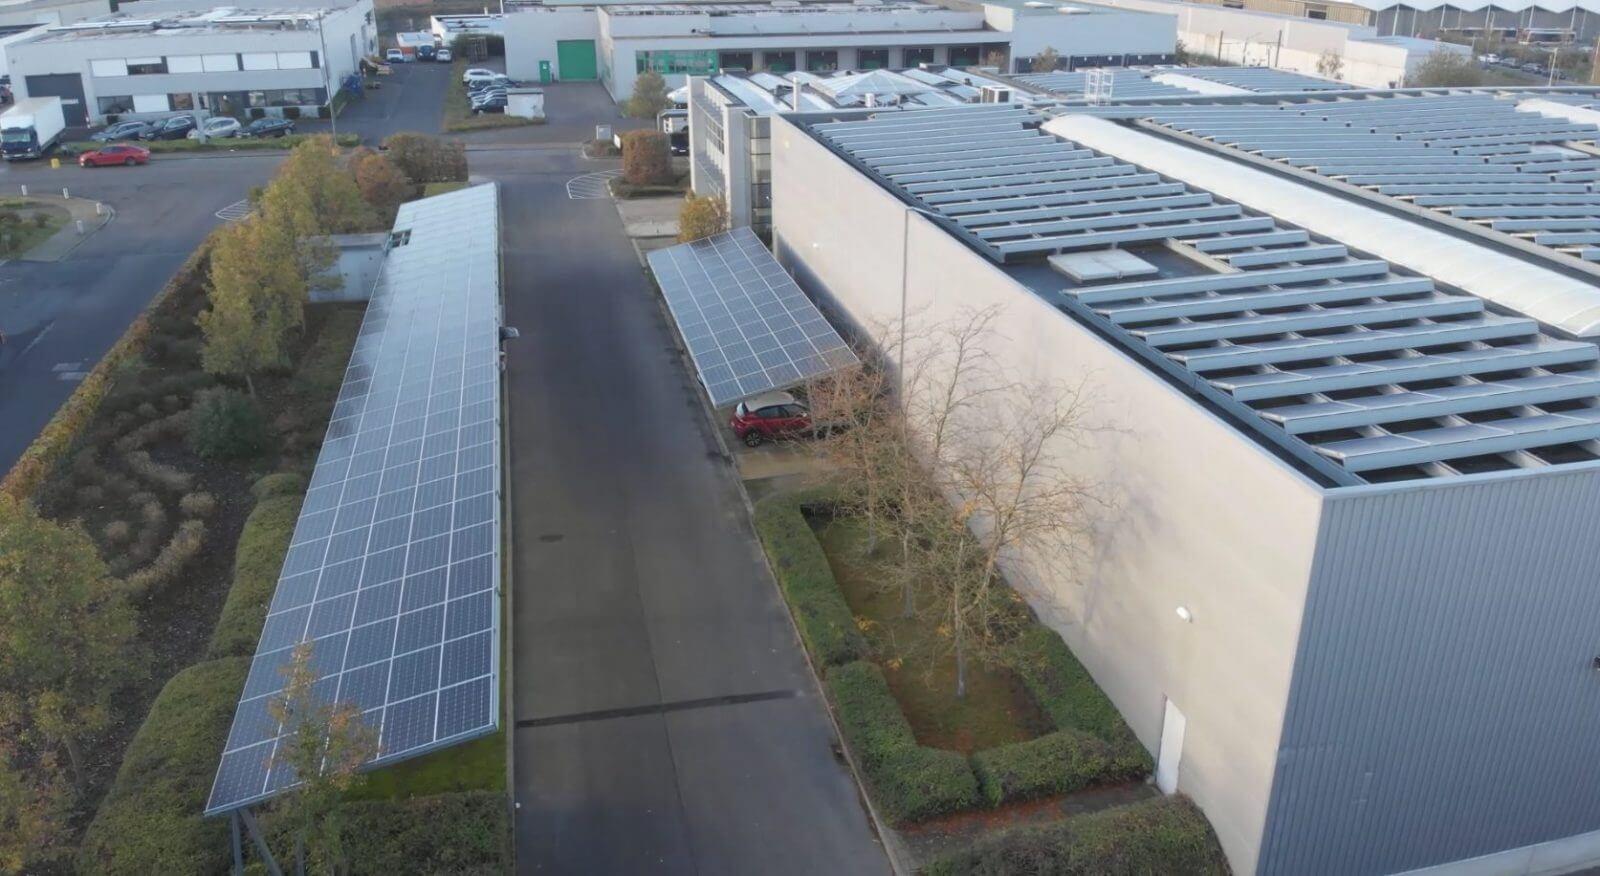 https://host-videos.s3.eu-west-3.amazonaws.com/turbel/video-paneaux-solaires-raccourcie.mp4